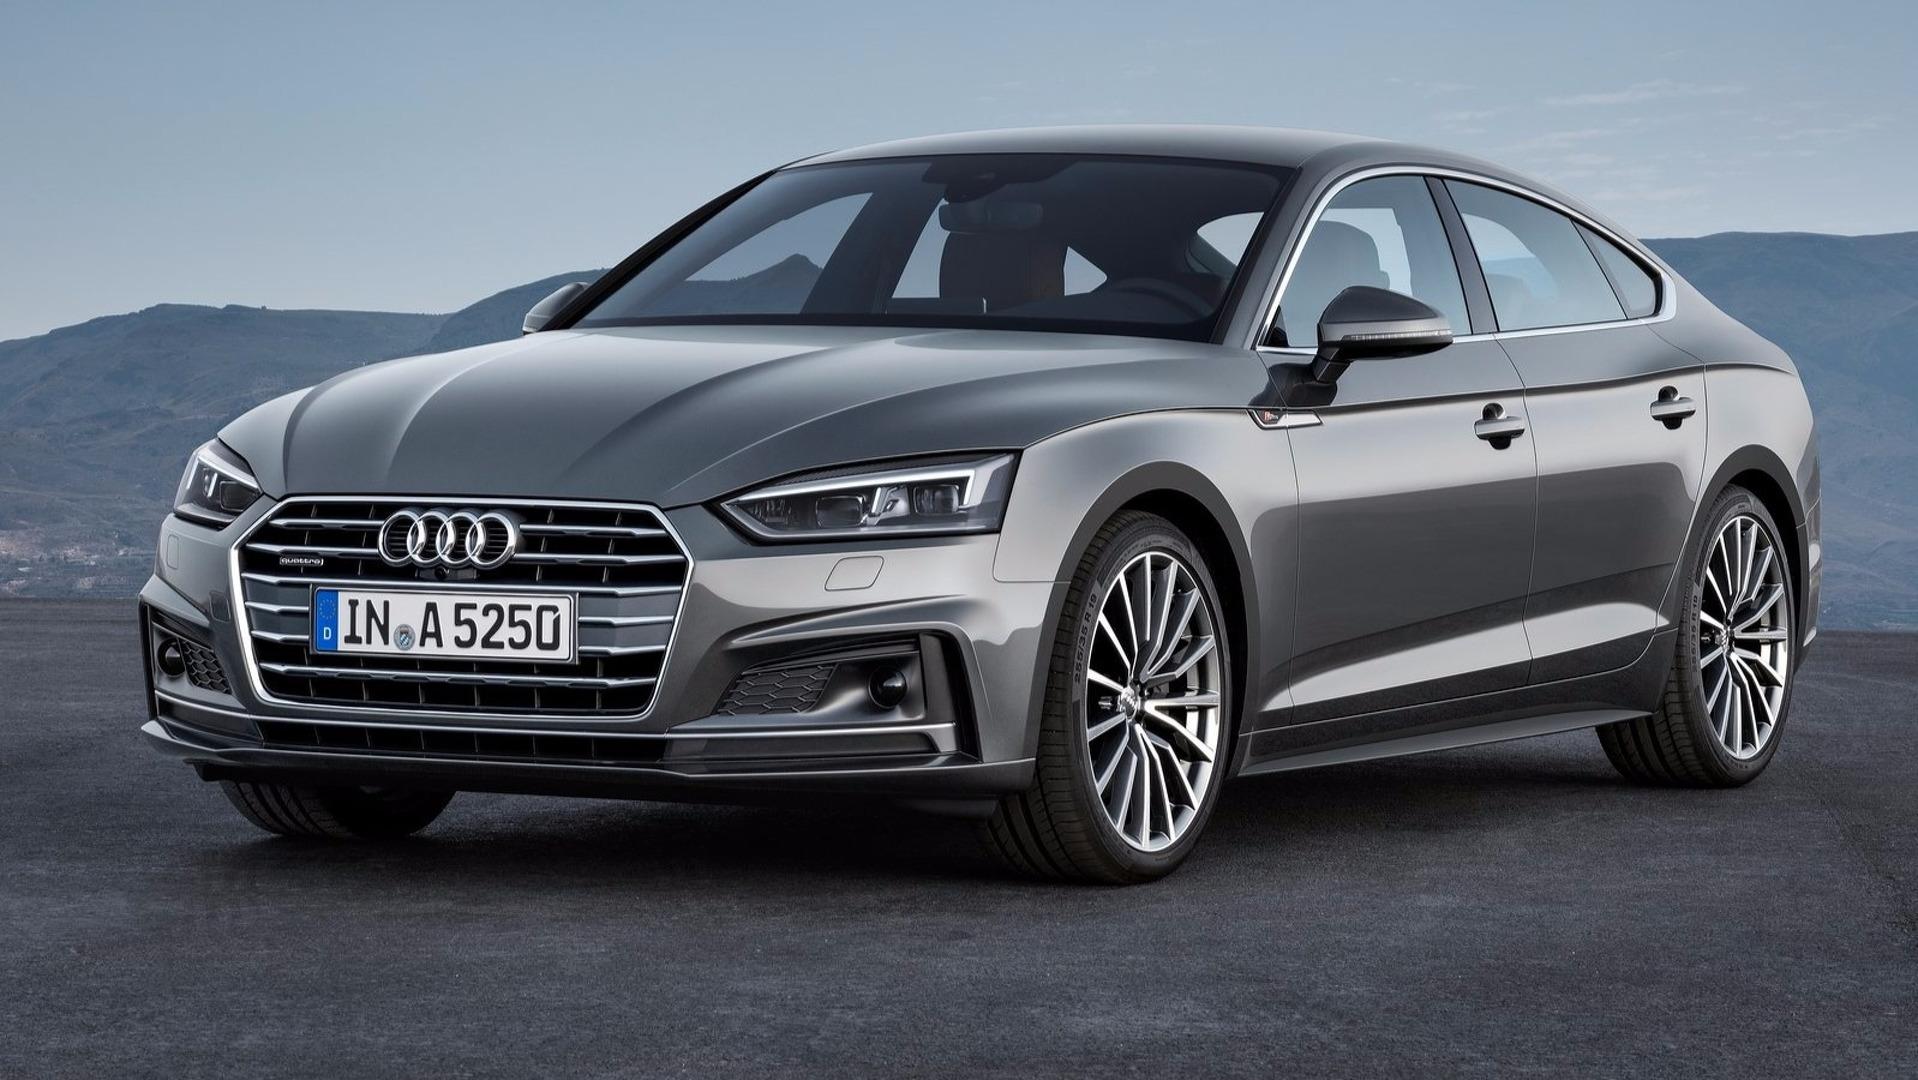 Reprogrammation Audi A5 40 TDI (2.0D) 190